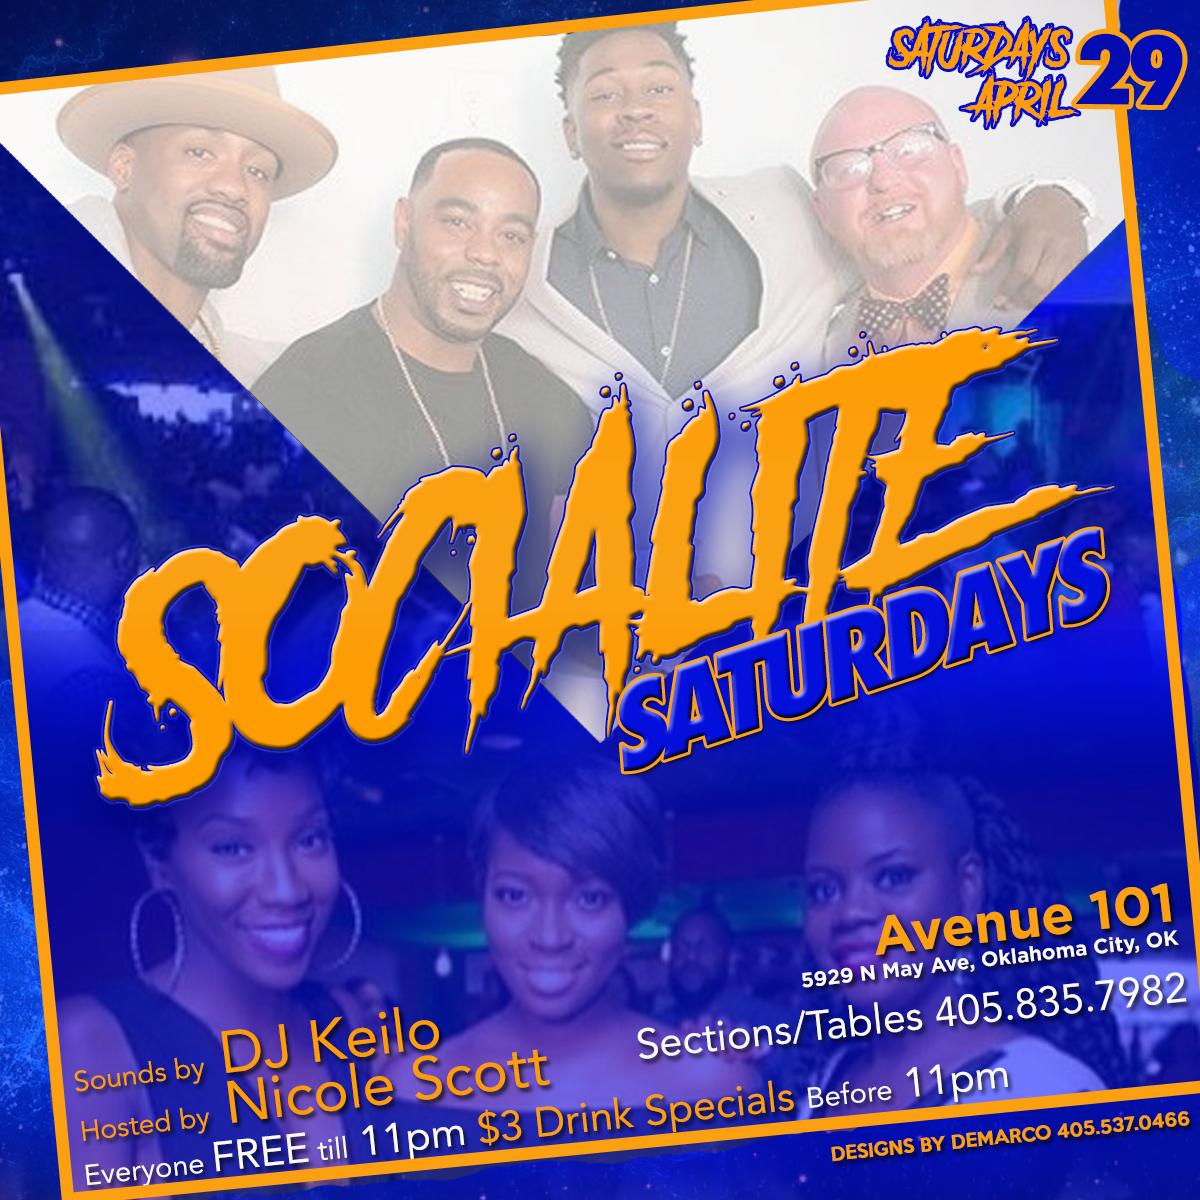 Socialite Saturdays.jpg